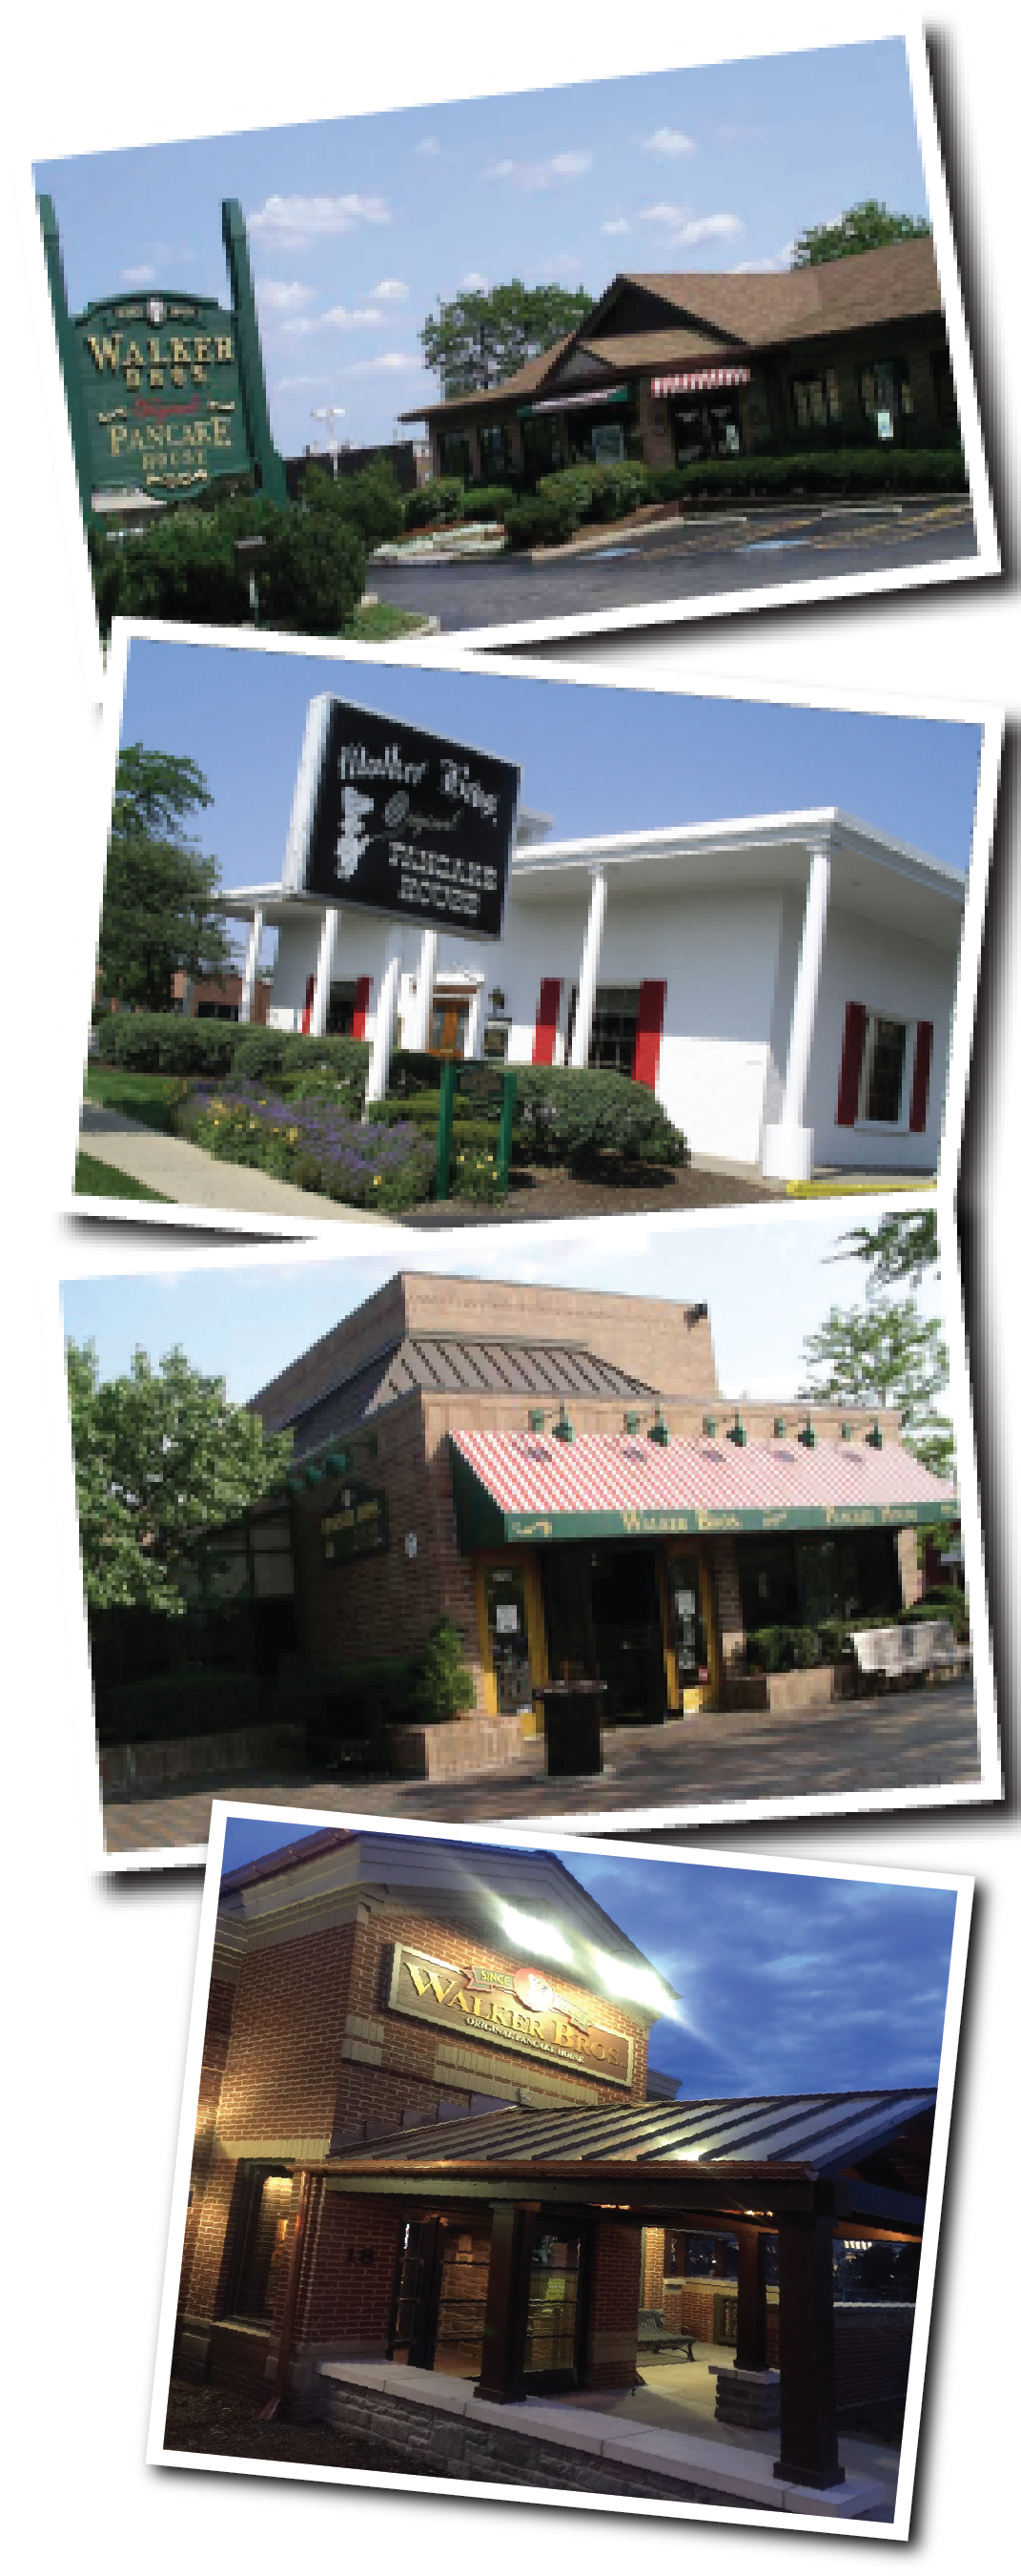 Walker Bros Locations